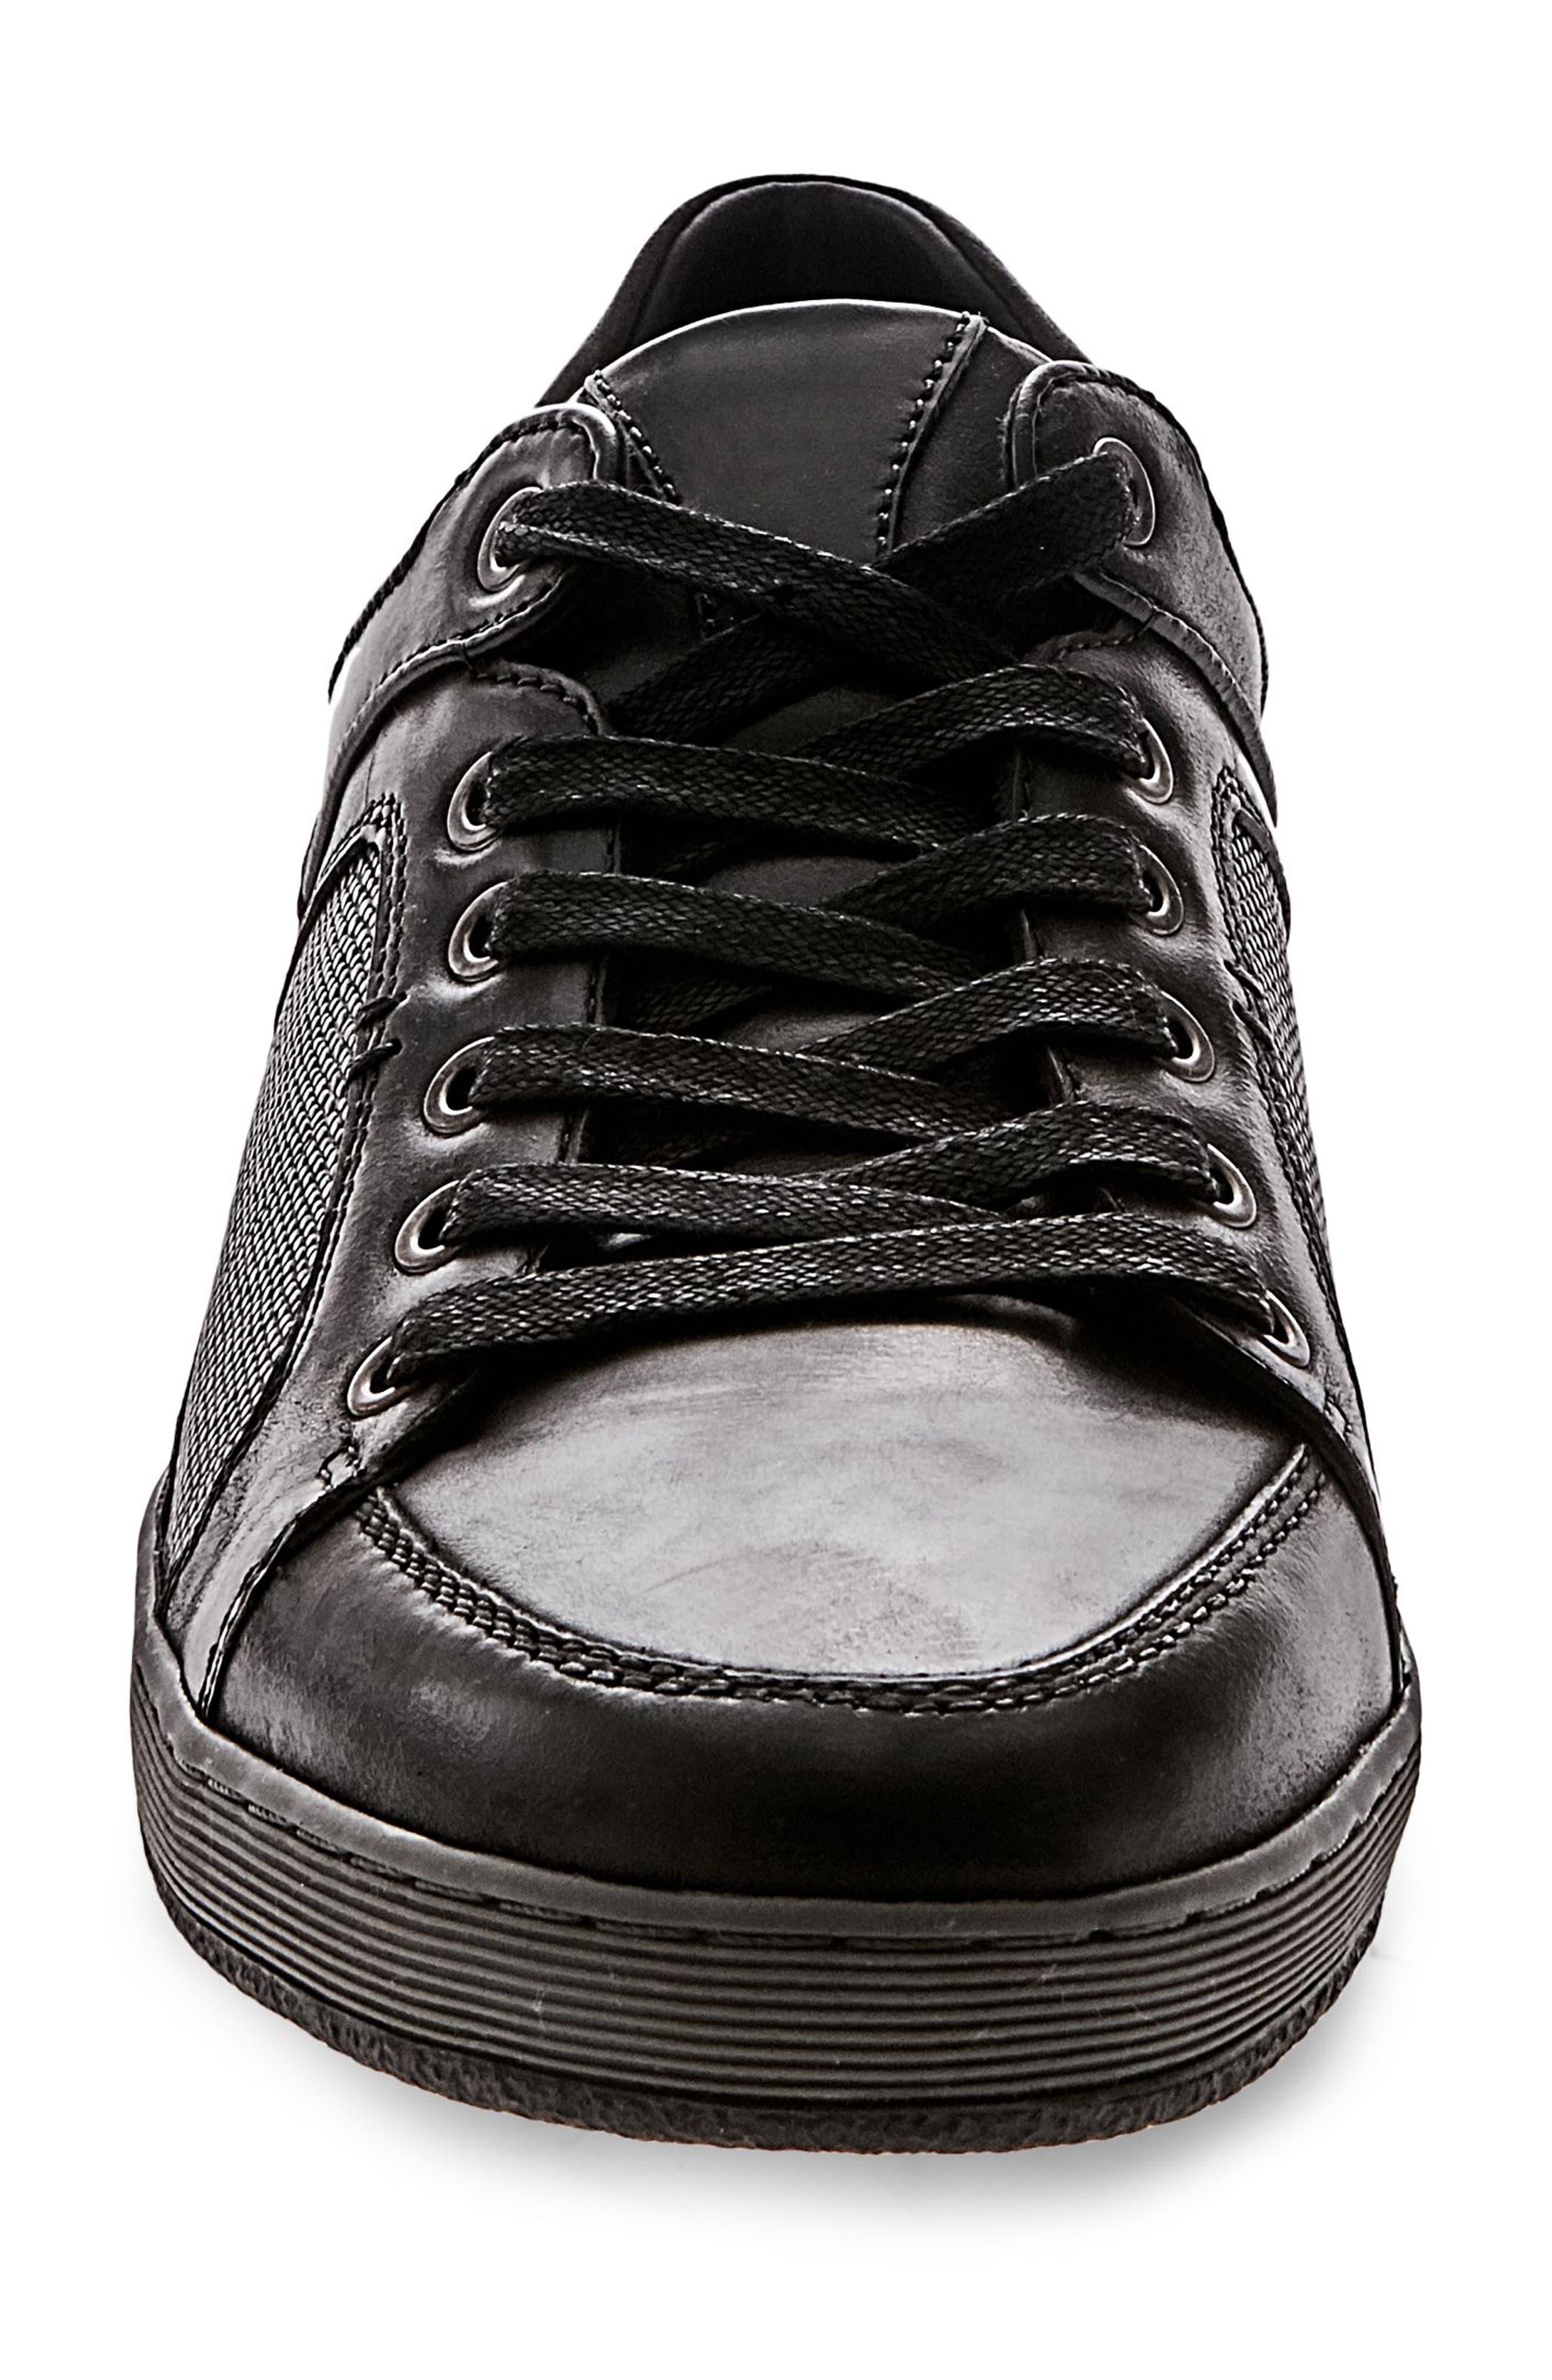 Palis Sneaker,                             Alternate thumbnail 4, color,                             017